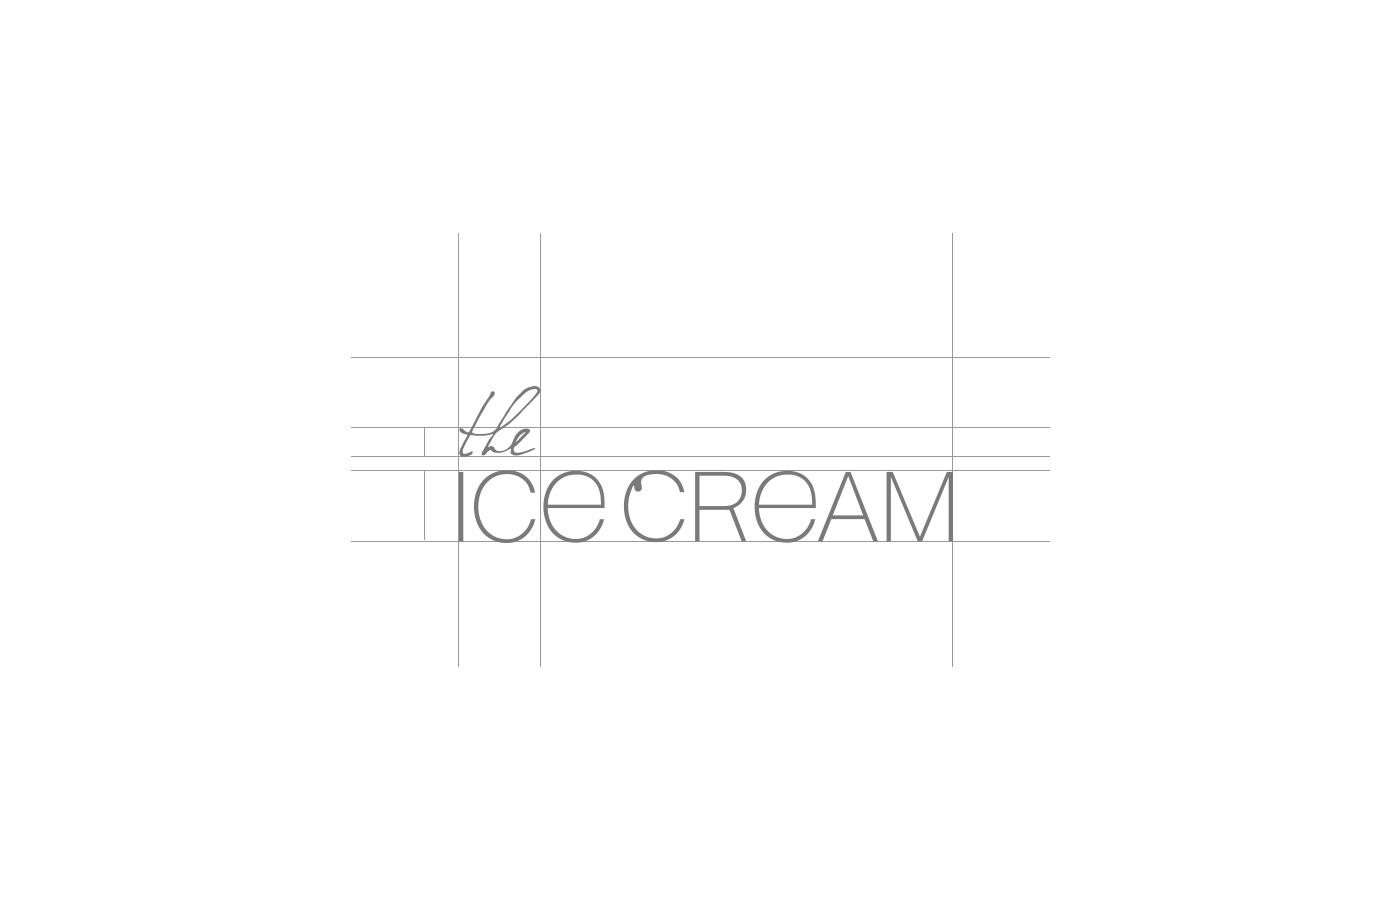 Брендинг для идеального мороженого THE ICE CREAM